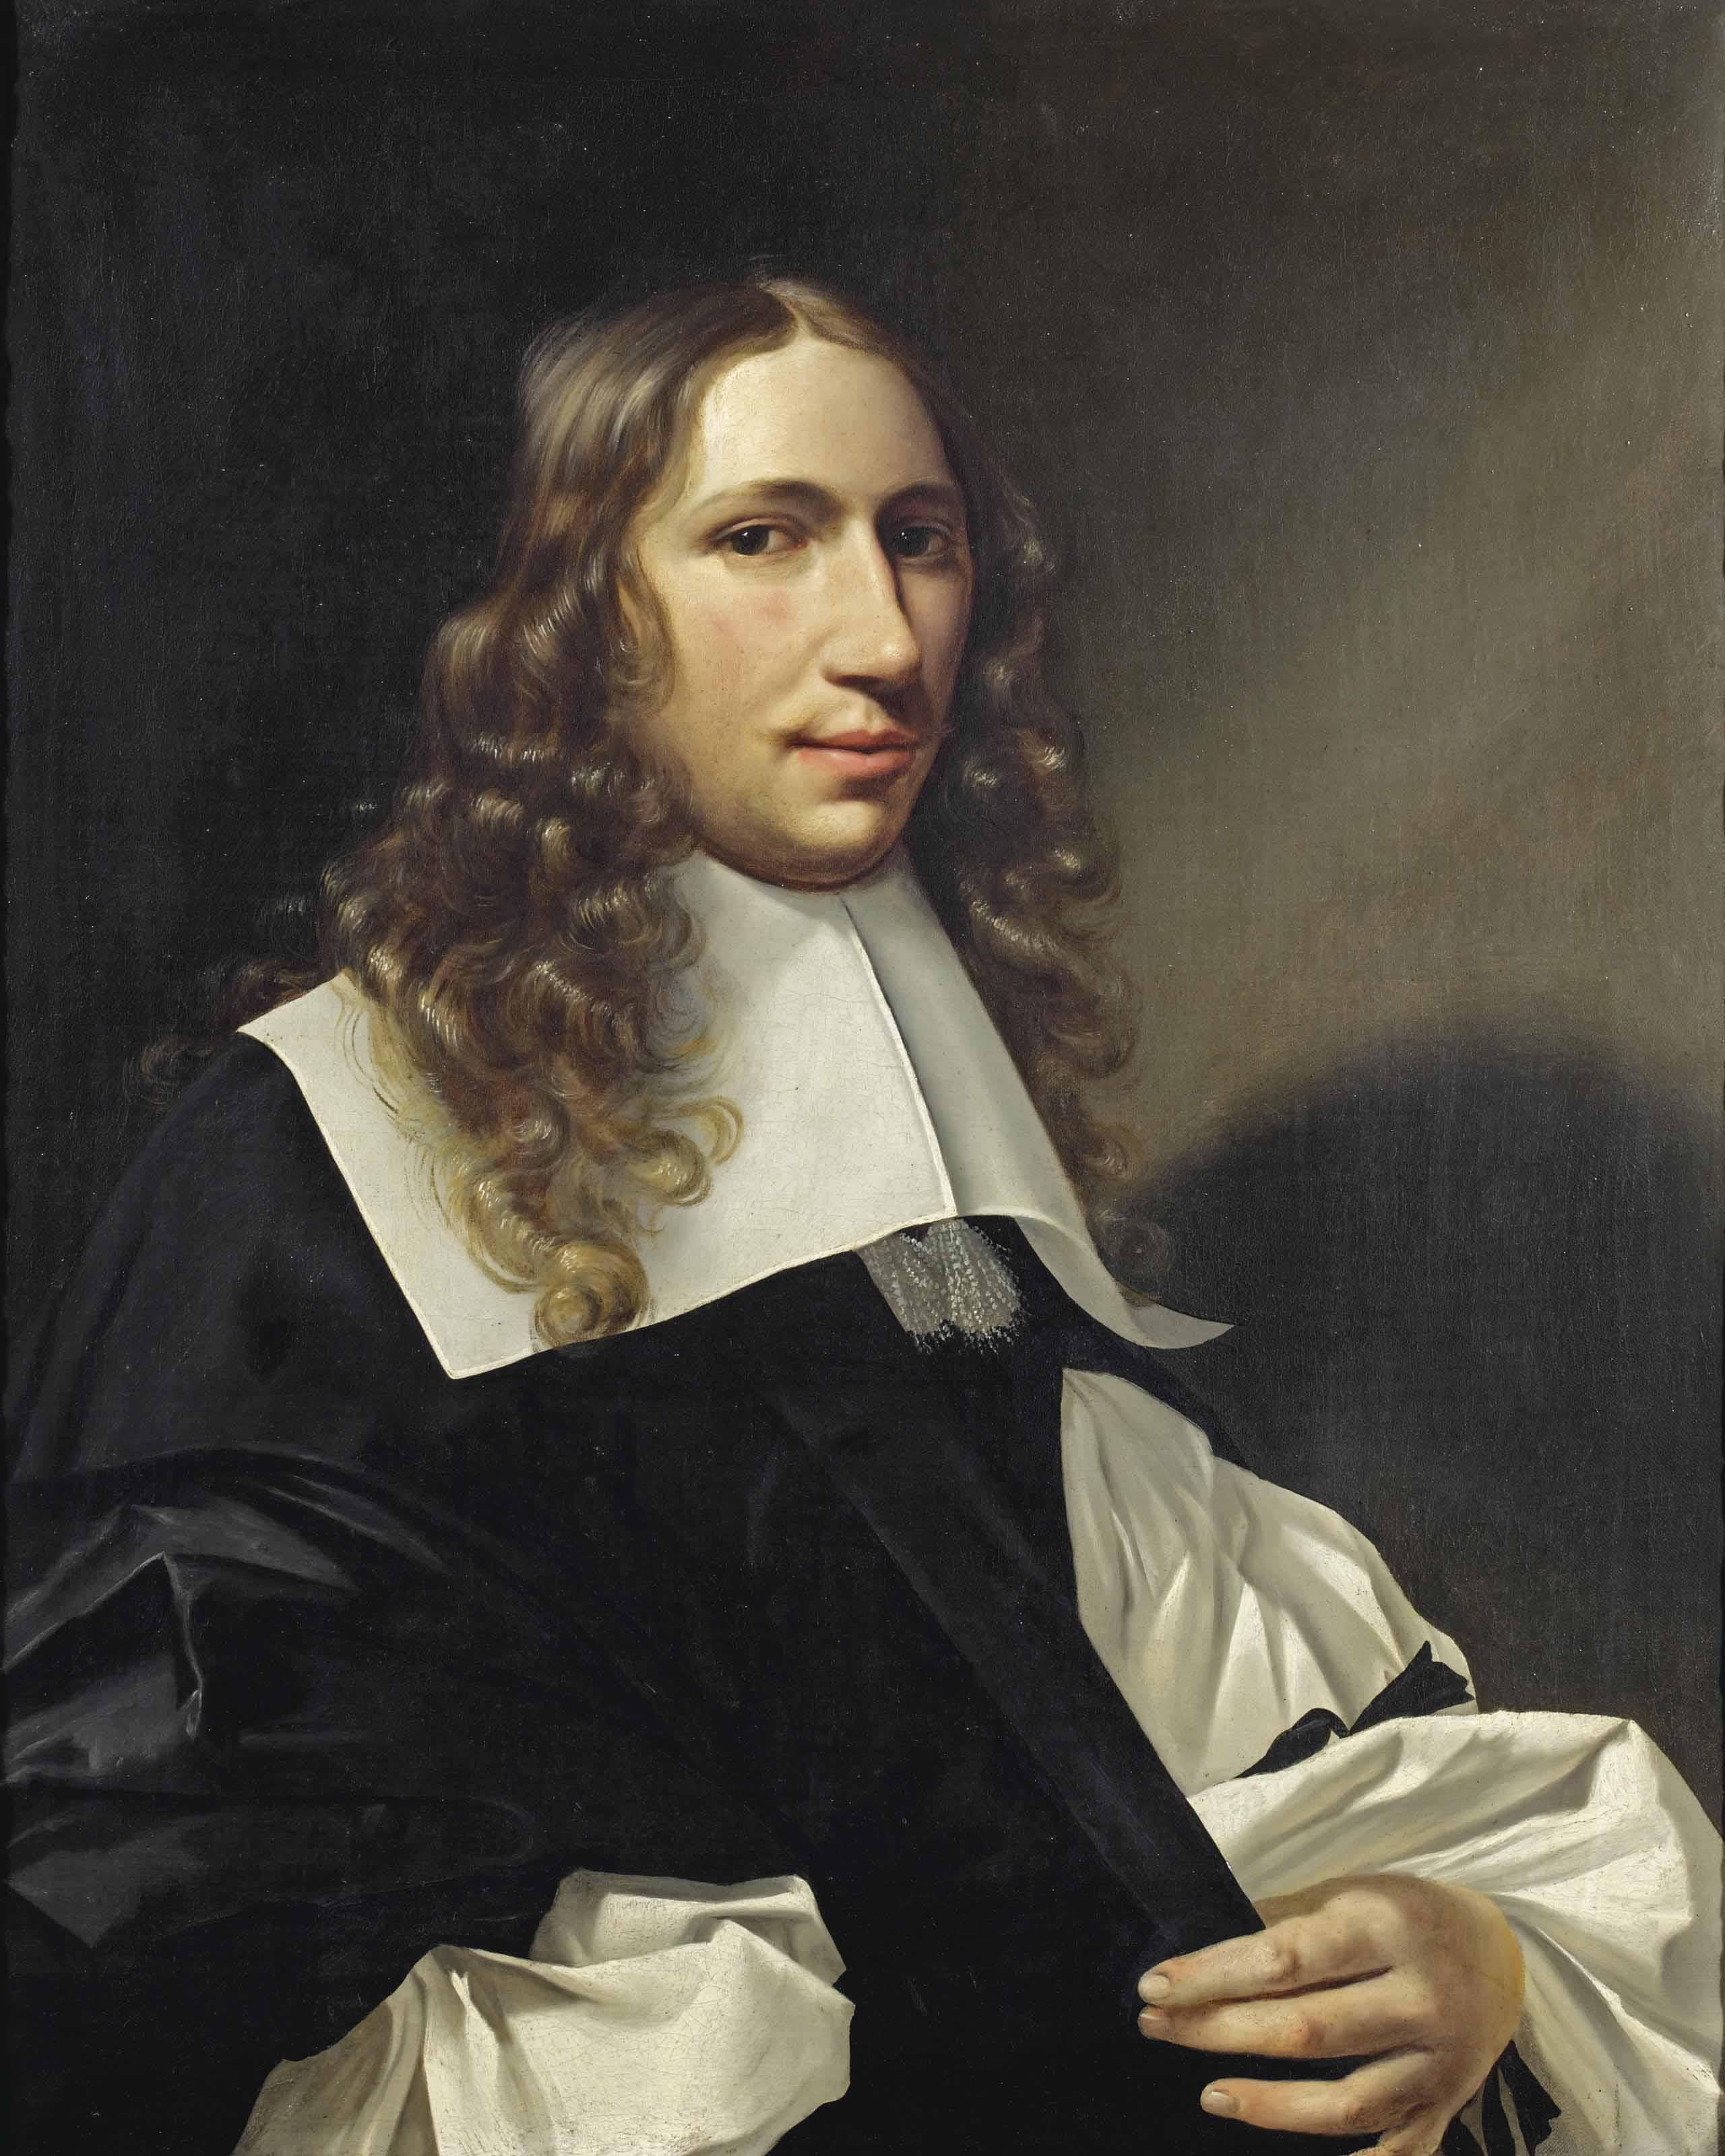 Christoffel Pierson (The Hague